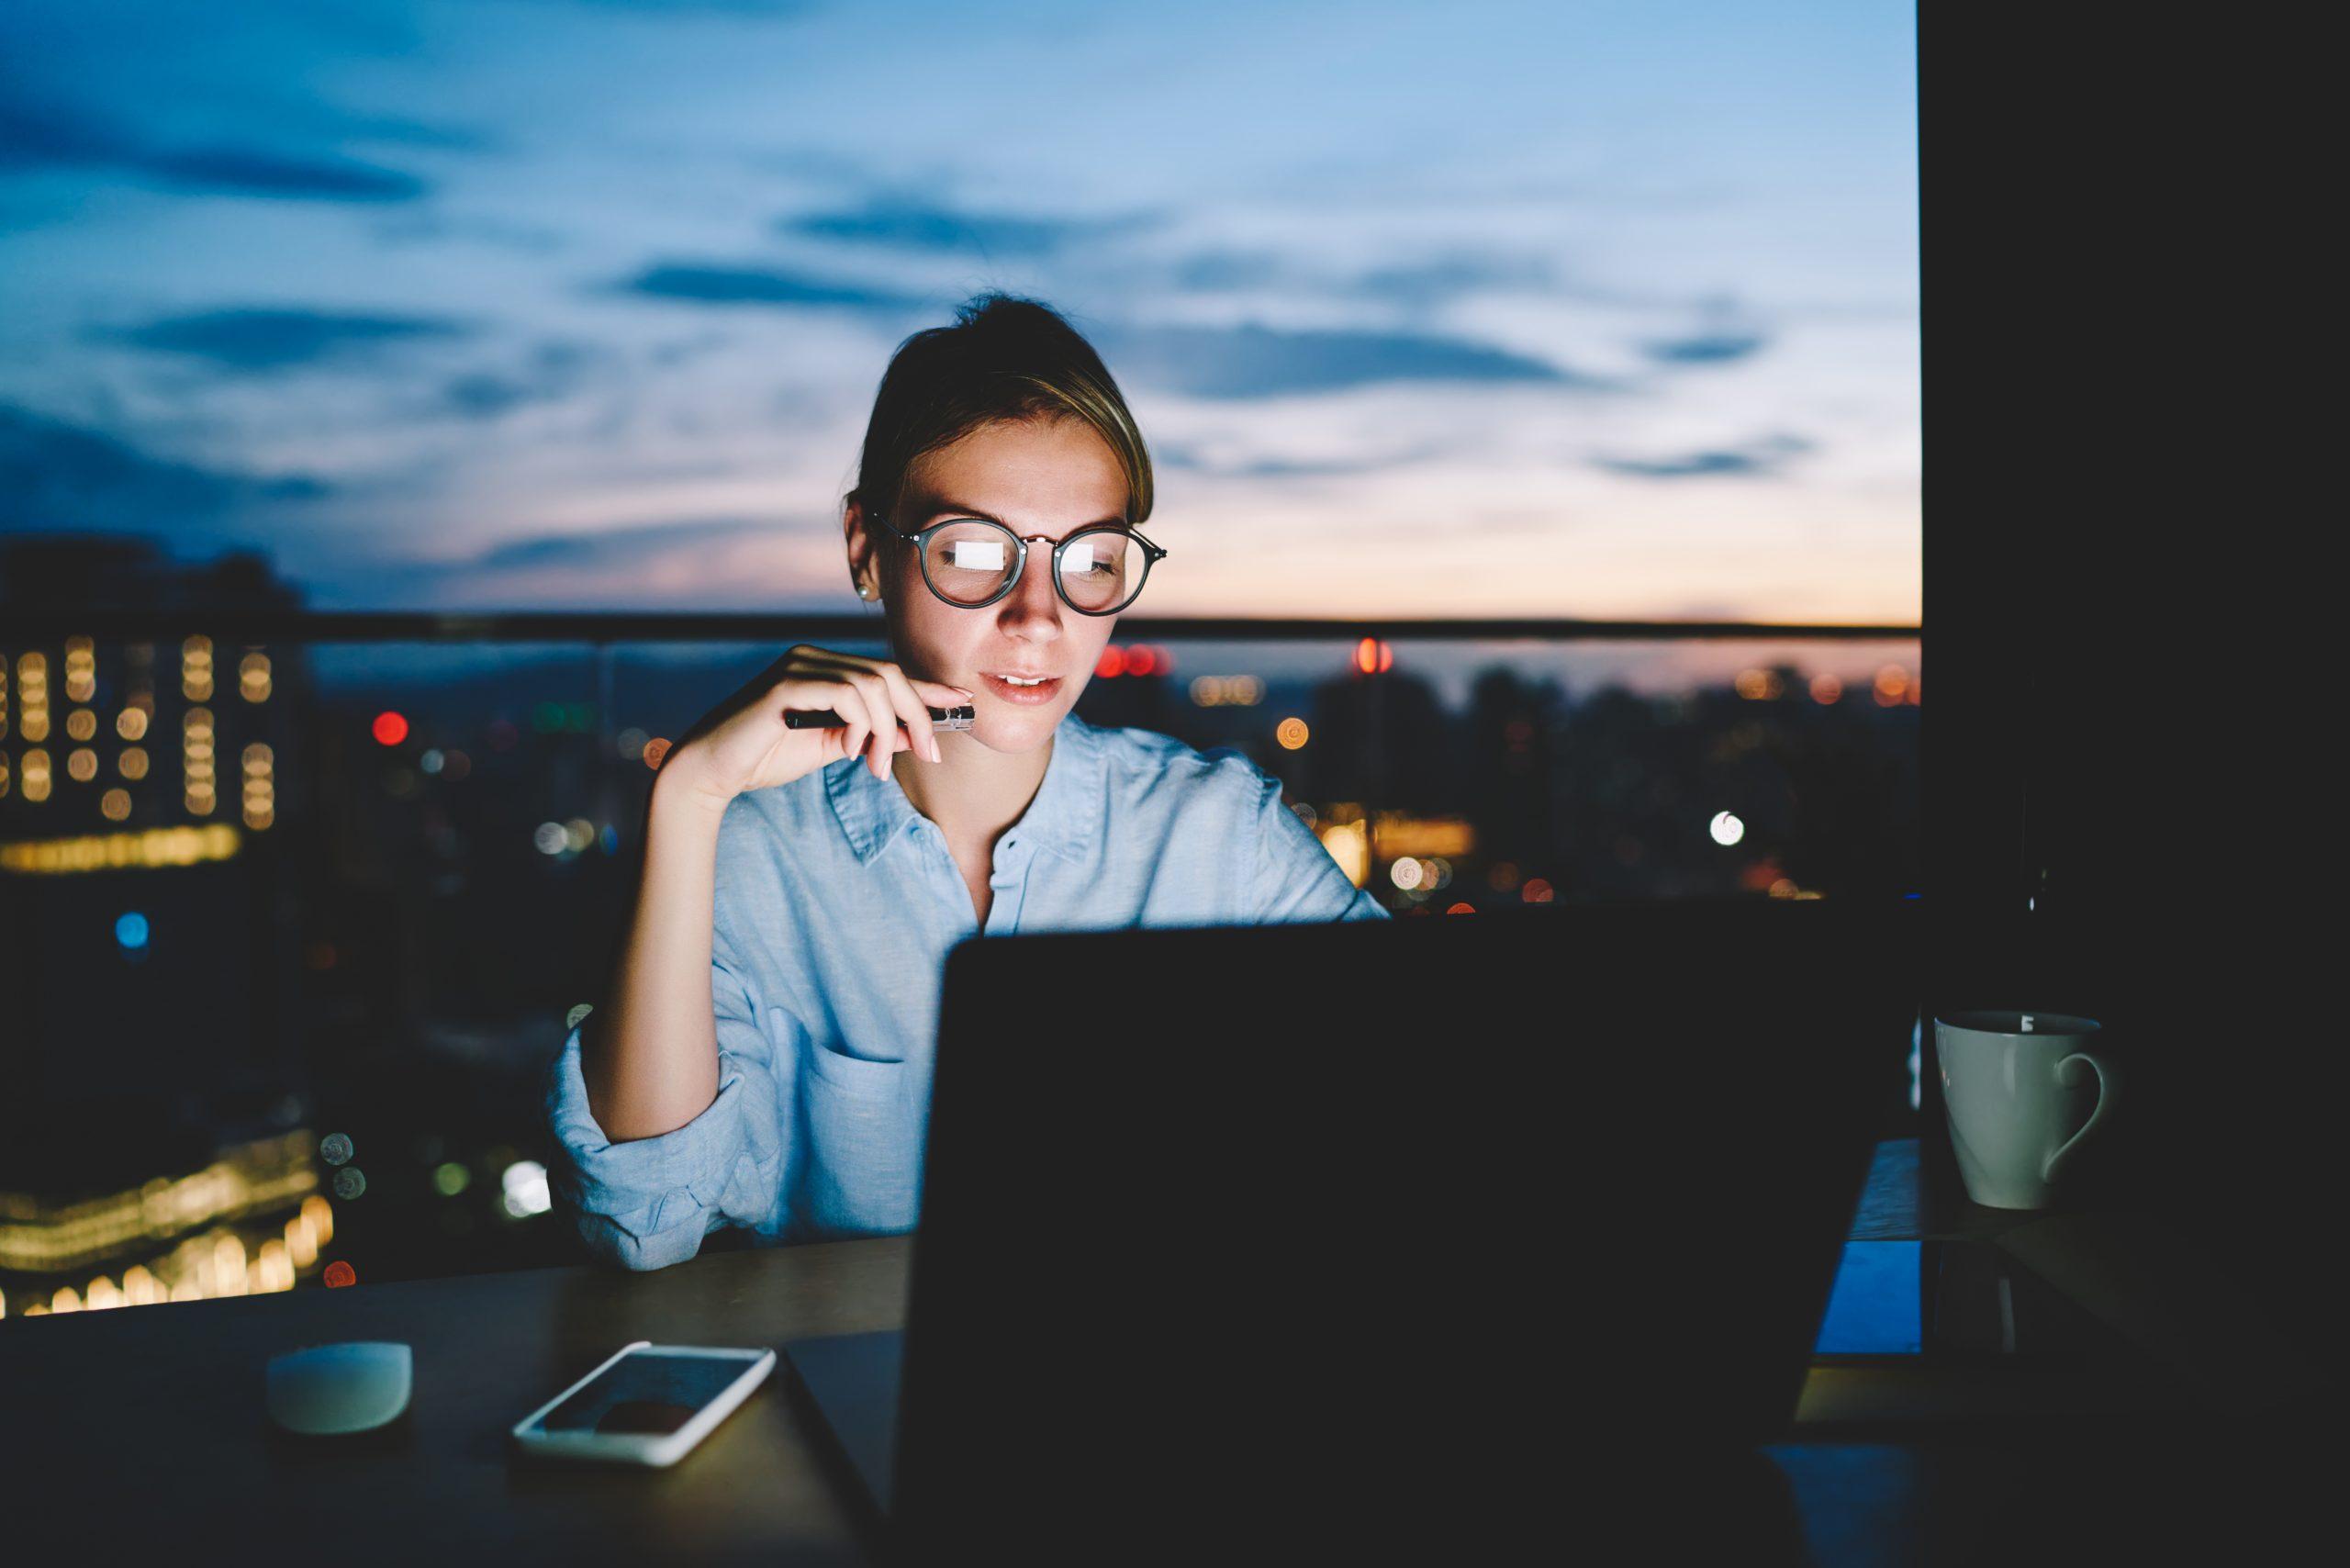 Talleres de Formación en Ciberseguridad para Empresas